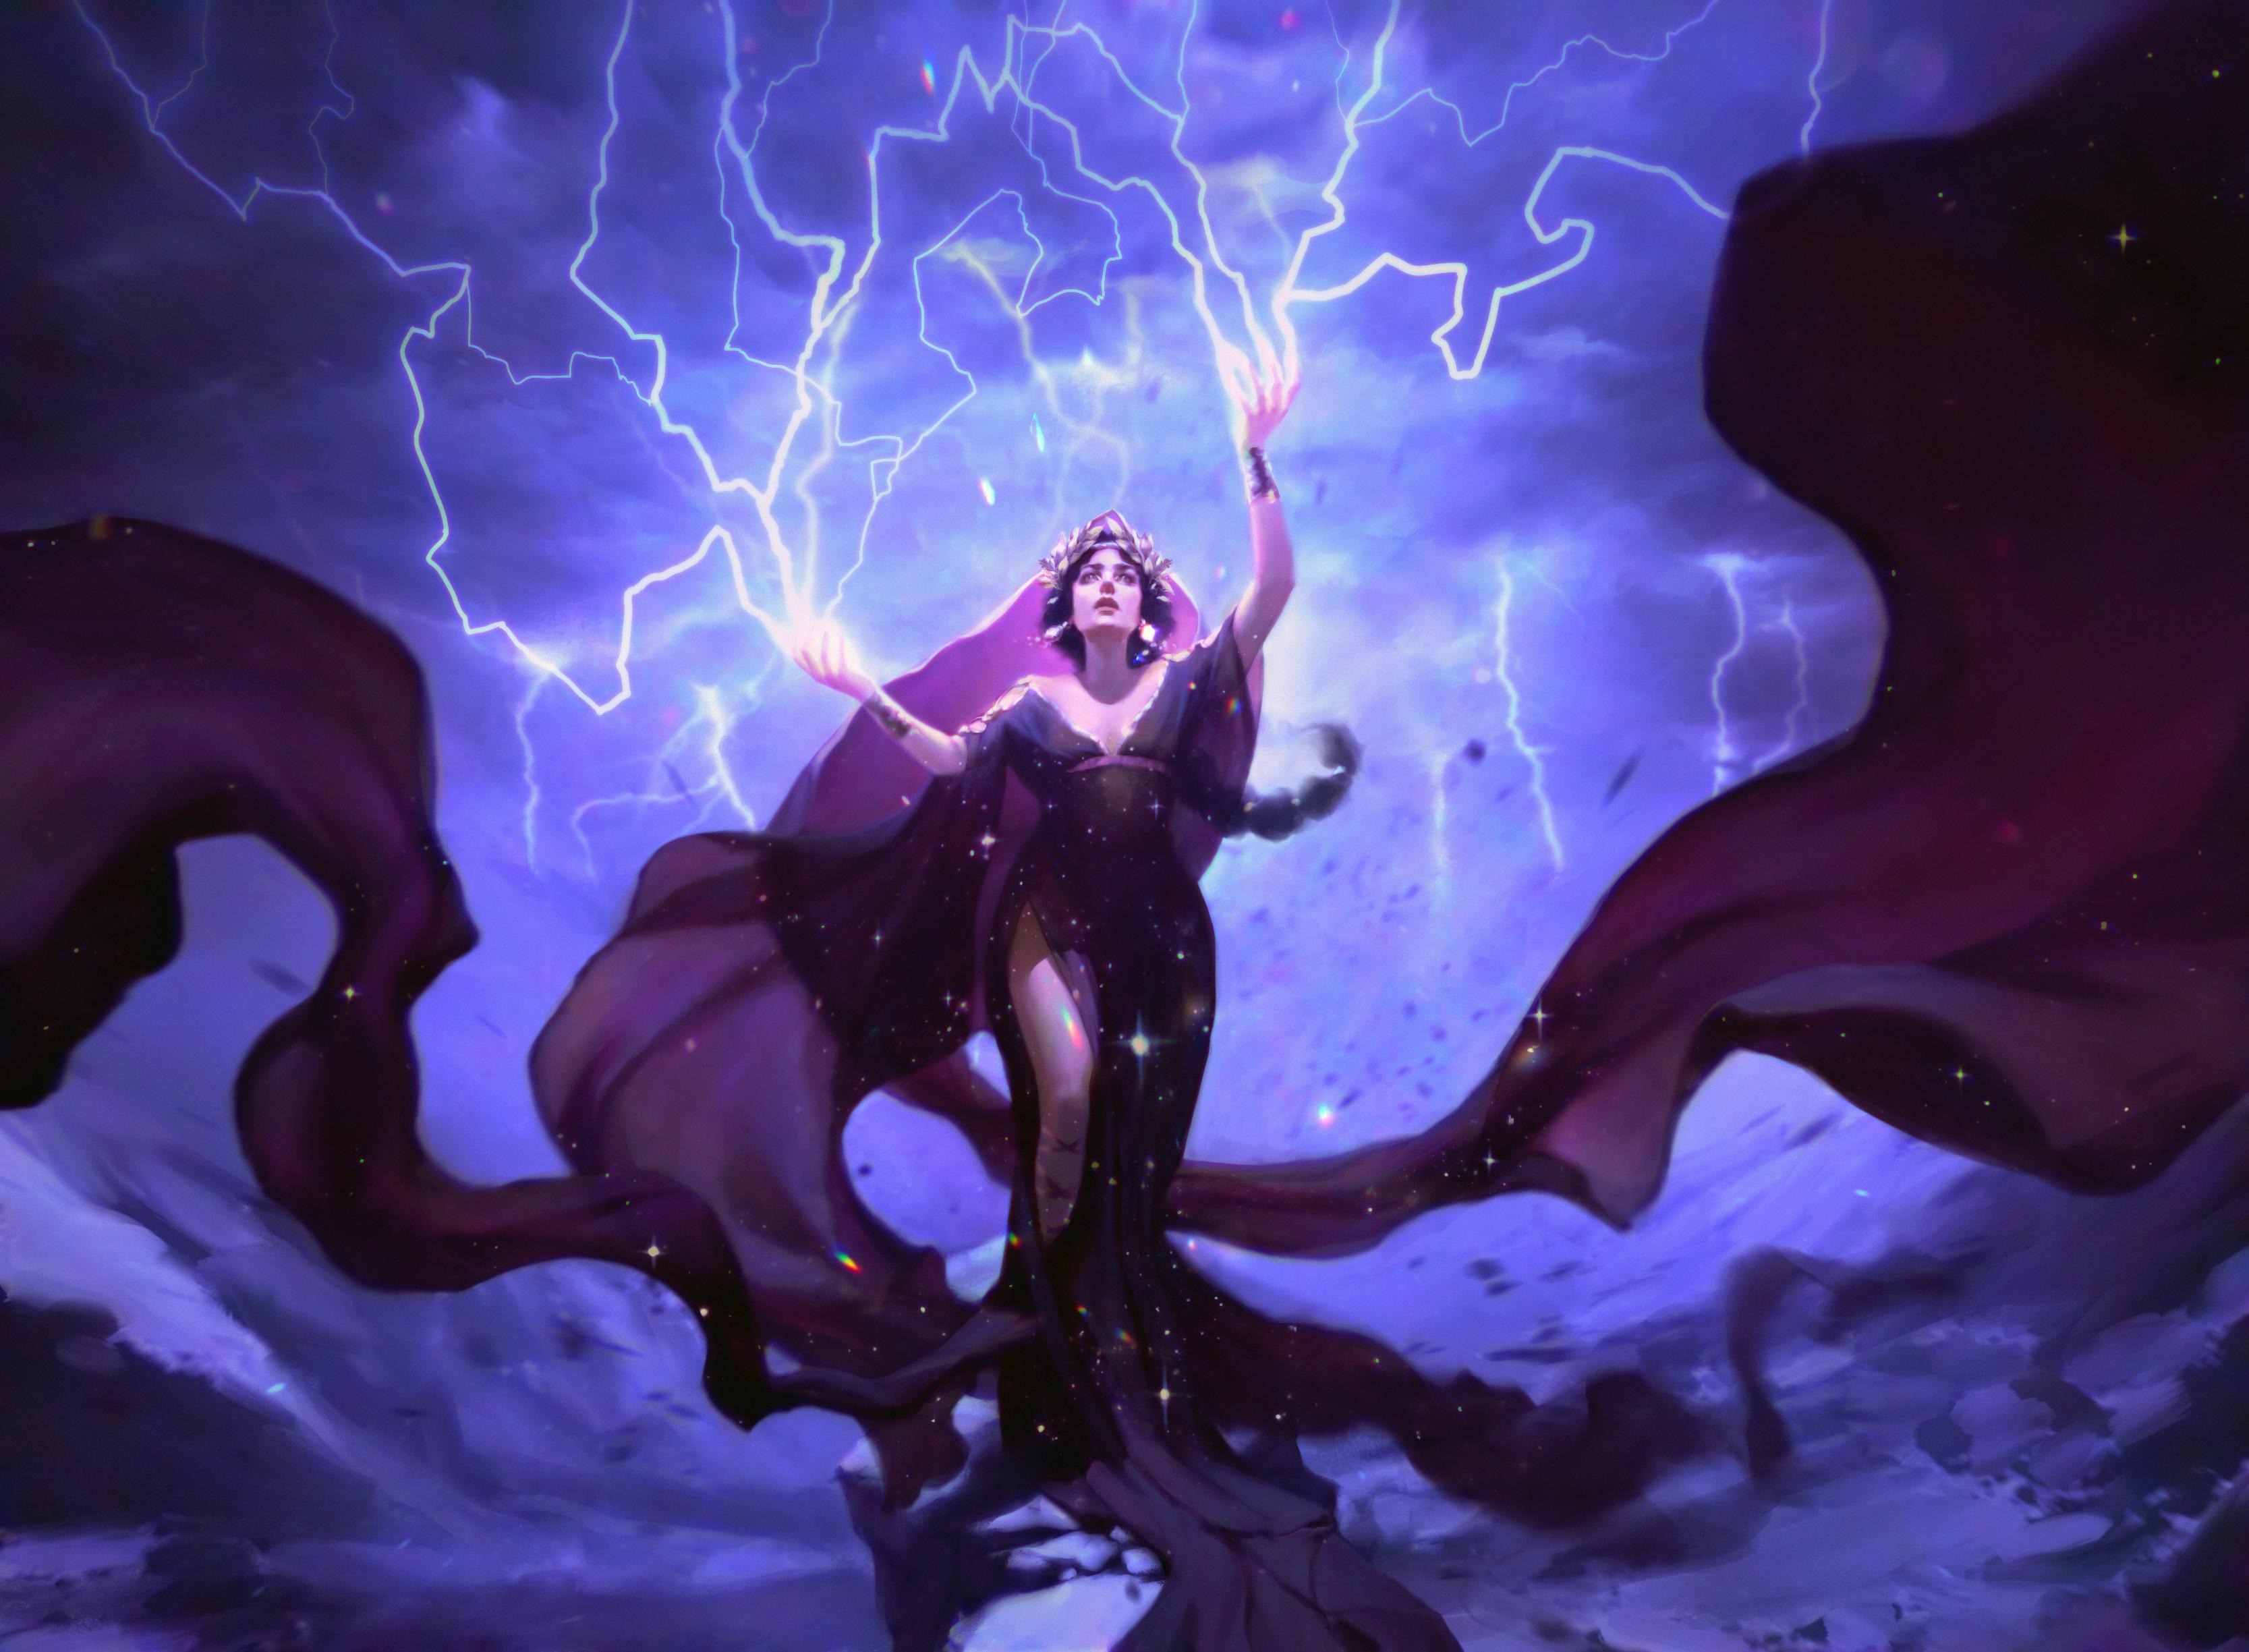 General 3334x2449 Pauline Voß Magic: The Gathering video games sparks lightning digital art fan art video game art drawing video game girls magic sorceress women ArtStation